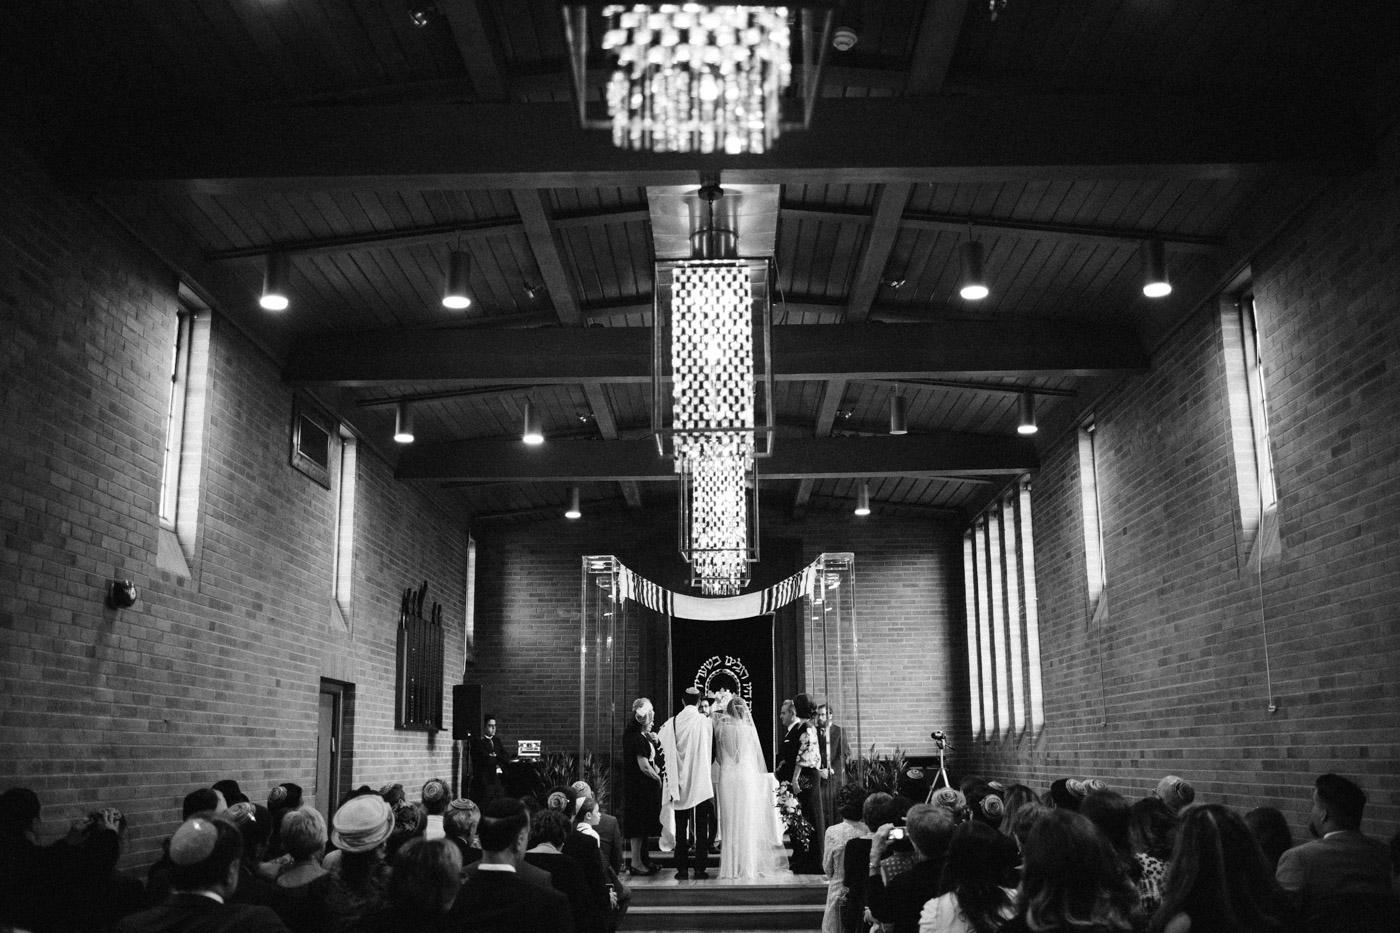 toronto_wedding_photographer_the_great_hall-59.jpg